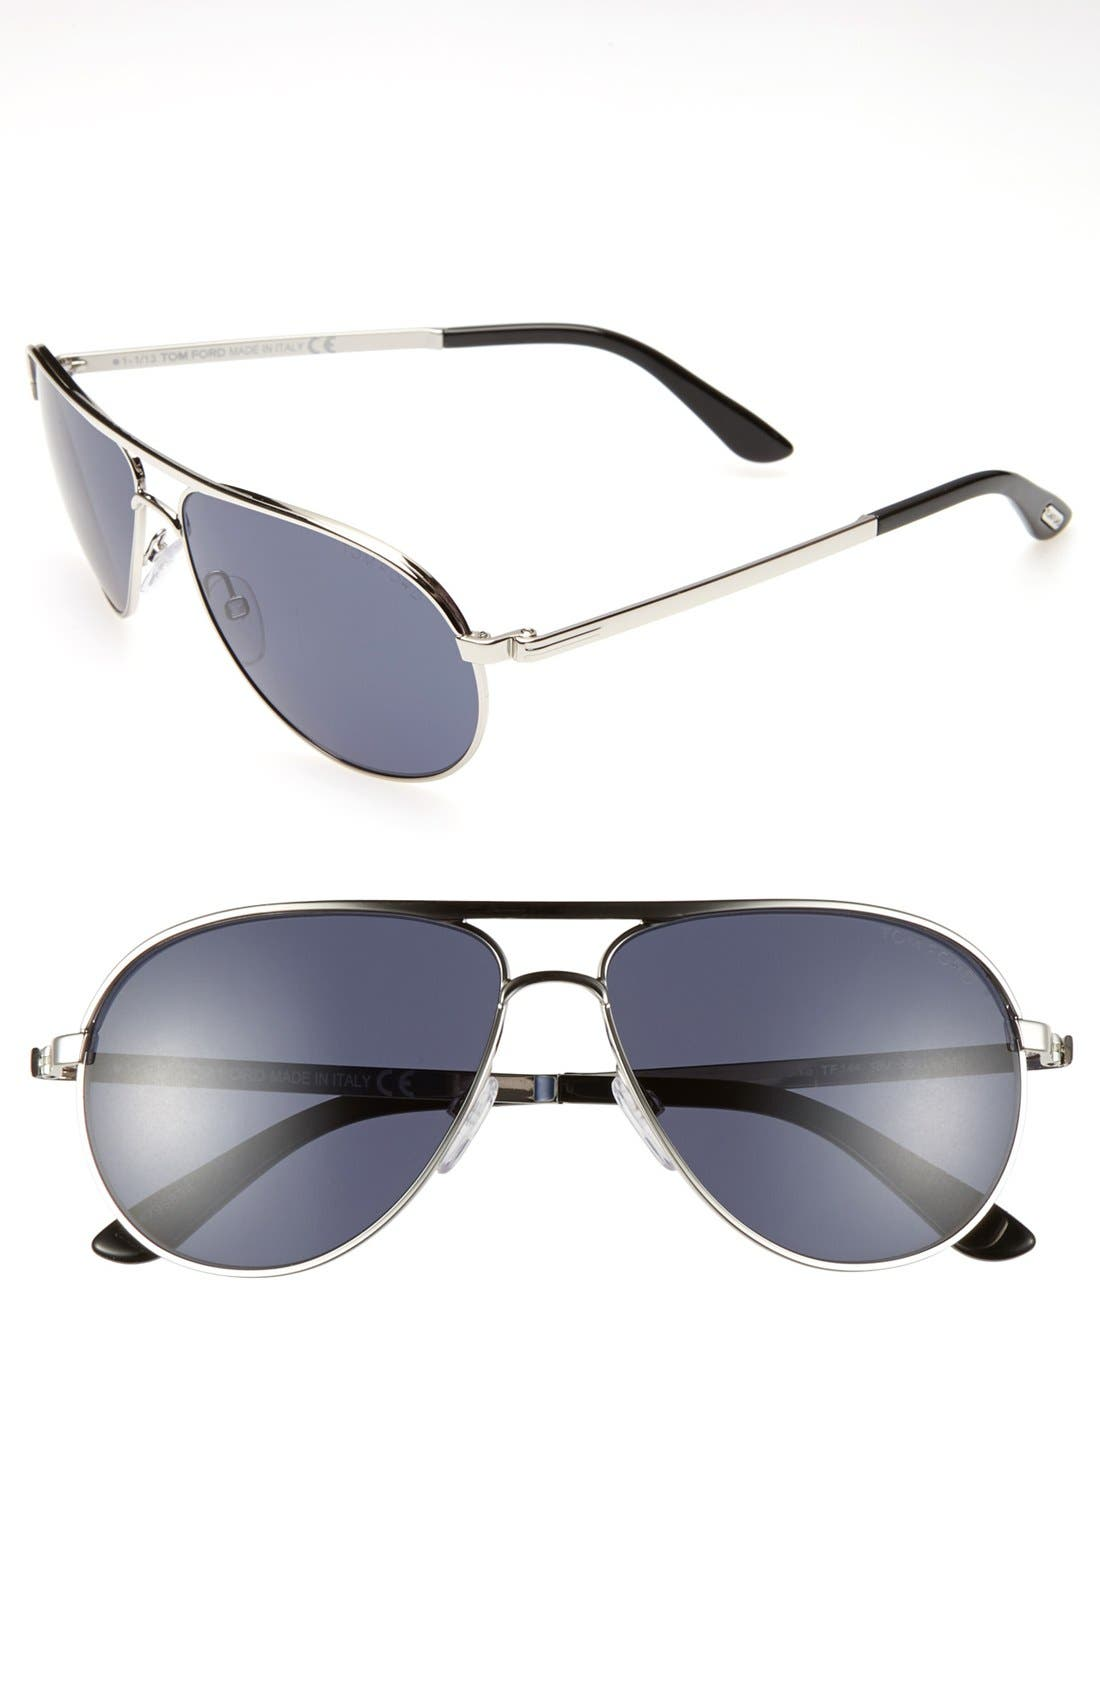 Main Image - Tom Ford 'Marko' 58mm Sunglasses